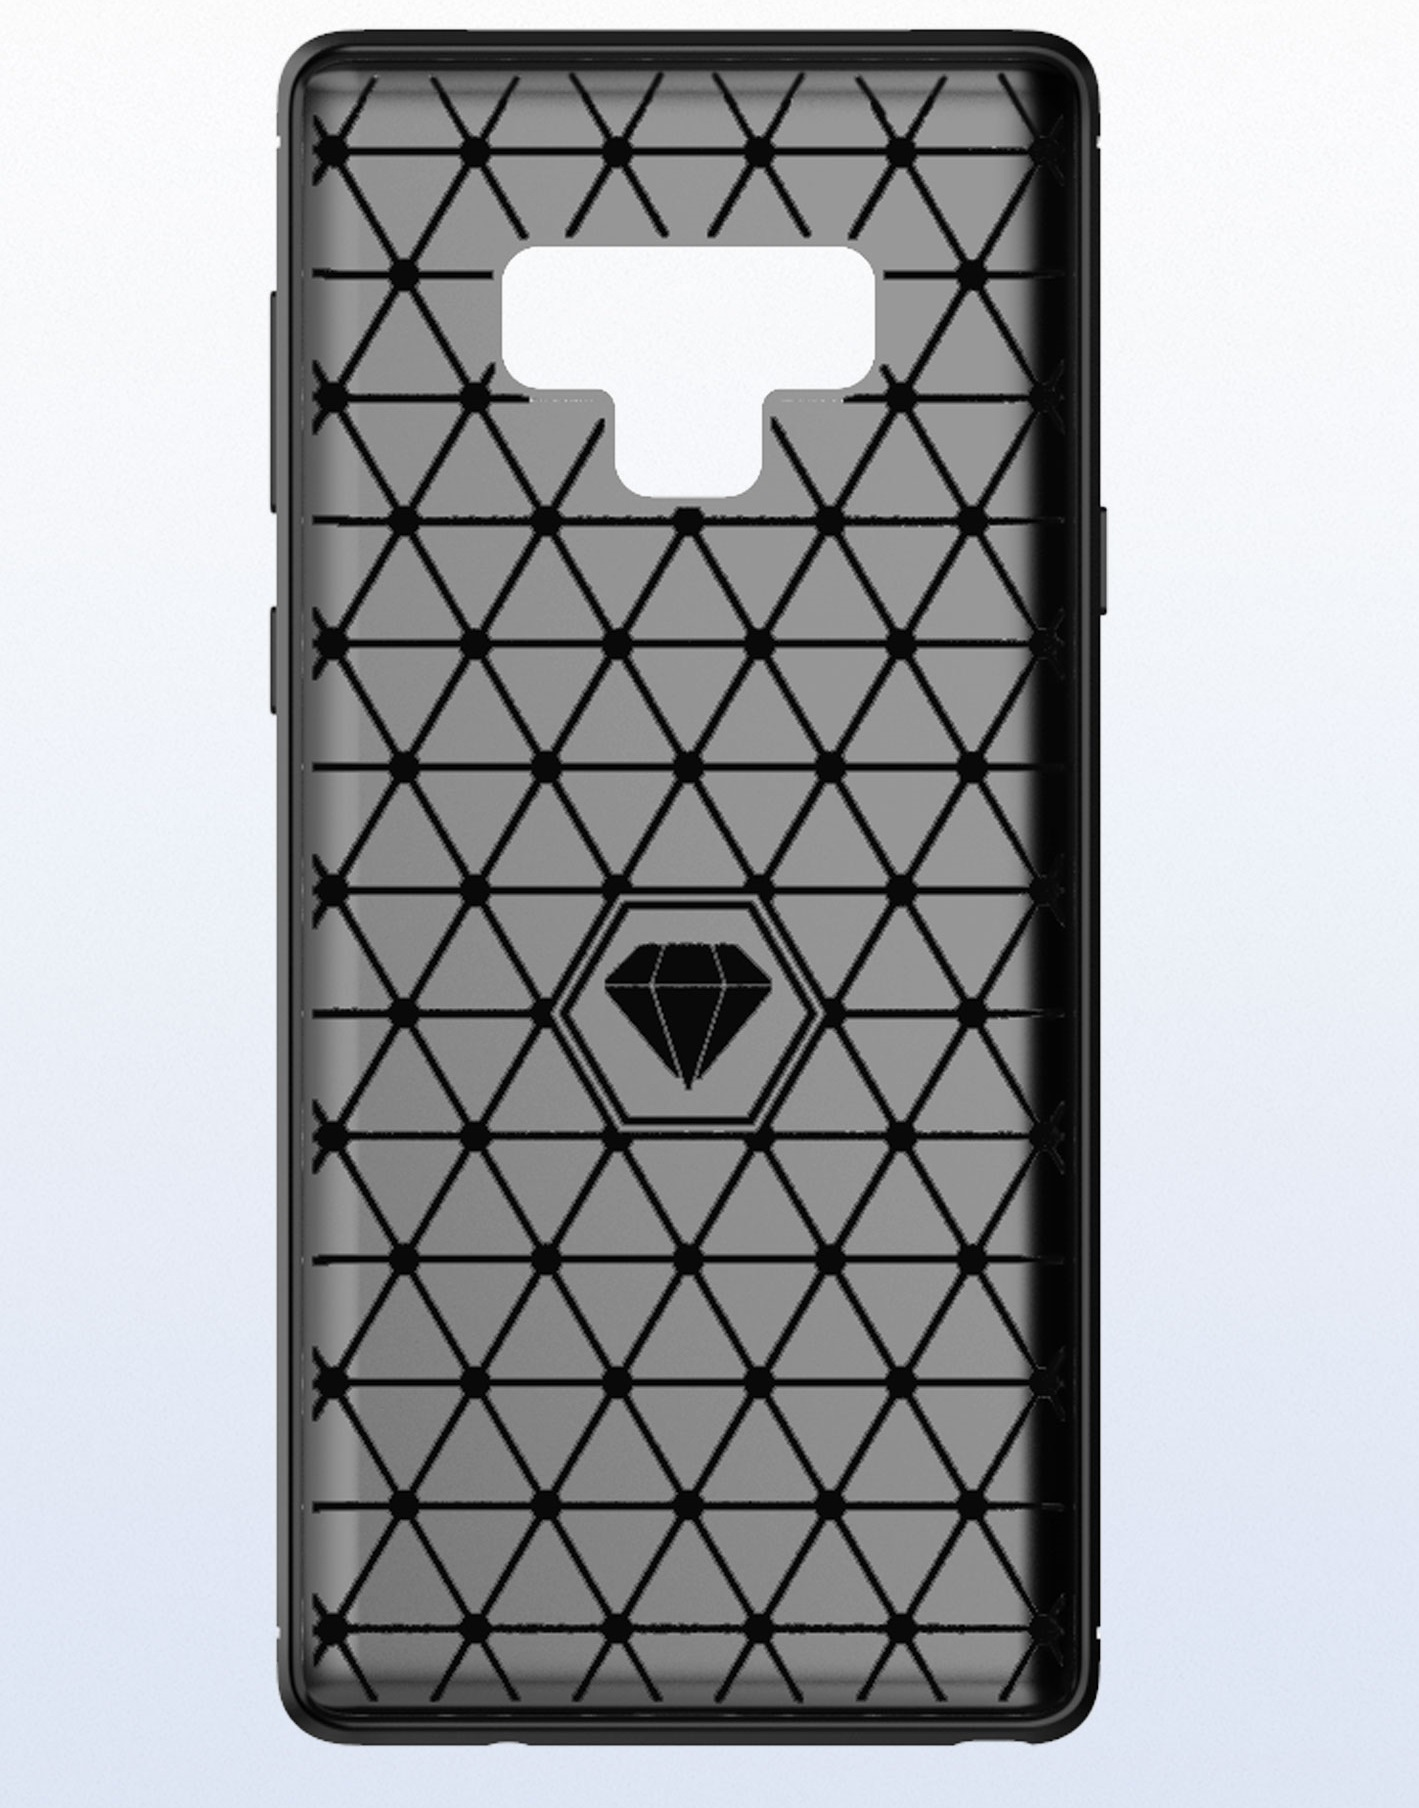 Чехол Samsung Galaxy Note 9 цвет Gray (серый), серия Carbon, Caseport